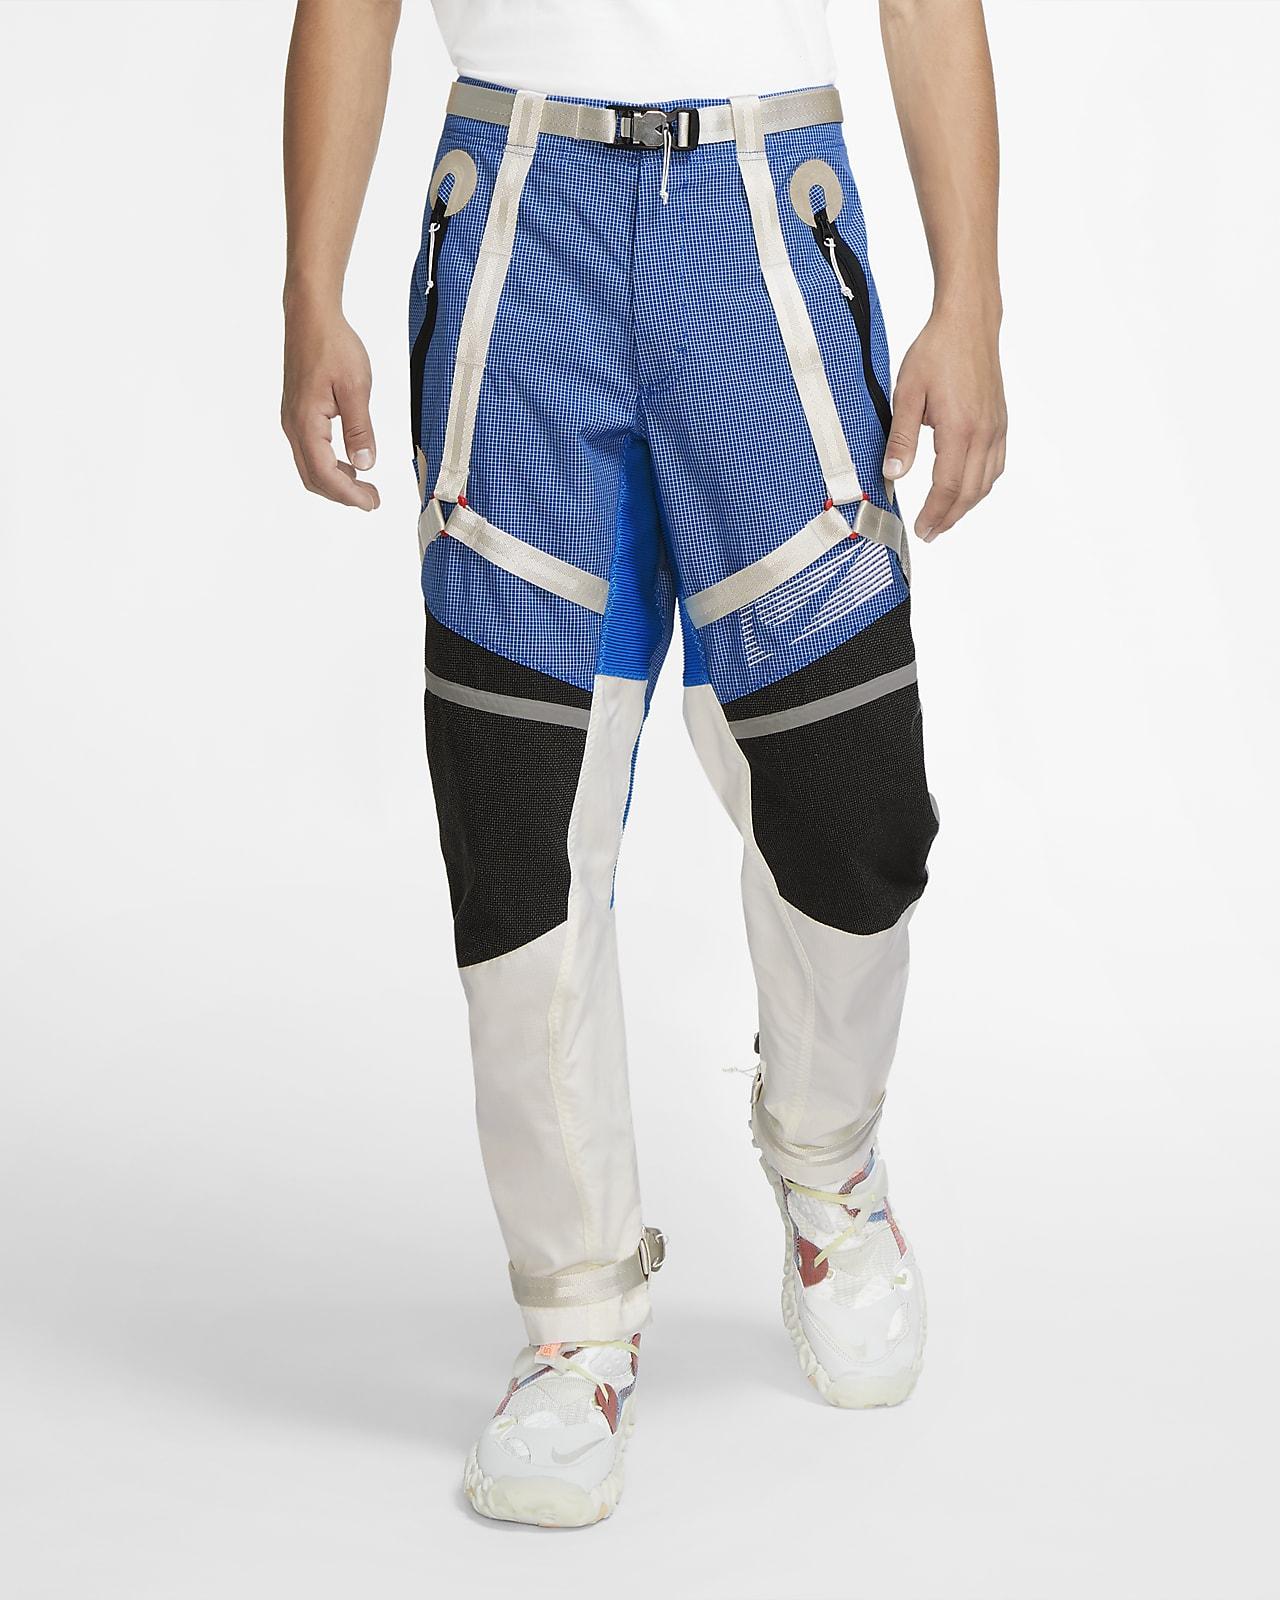 Nike ISPA-bukser